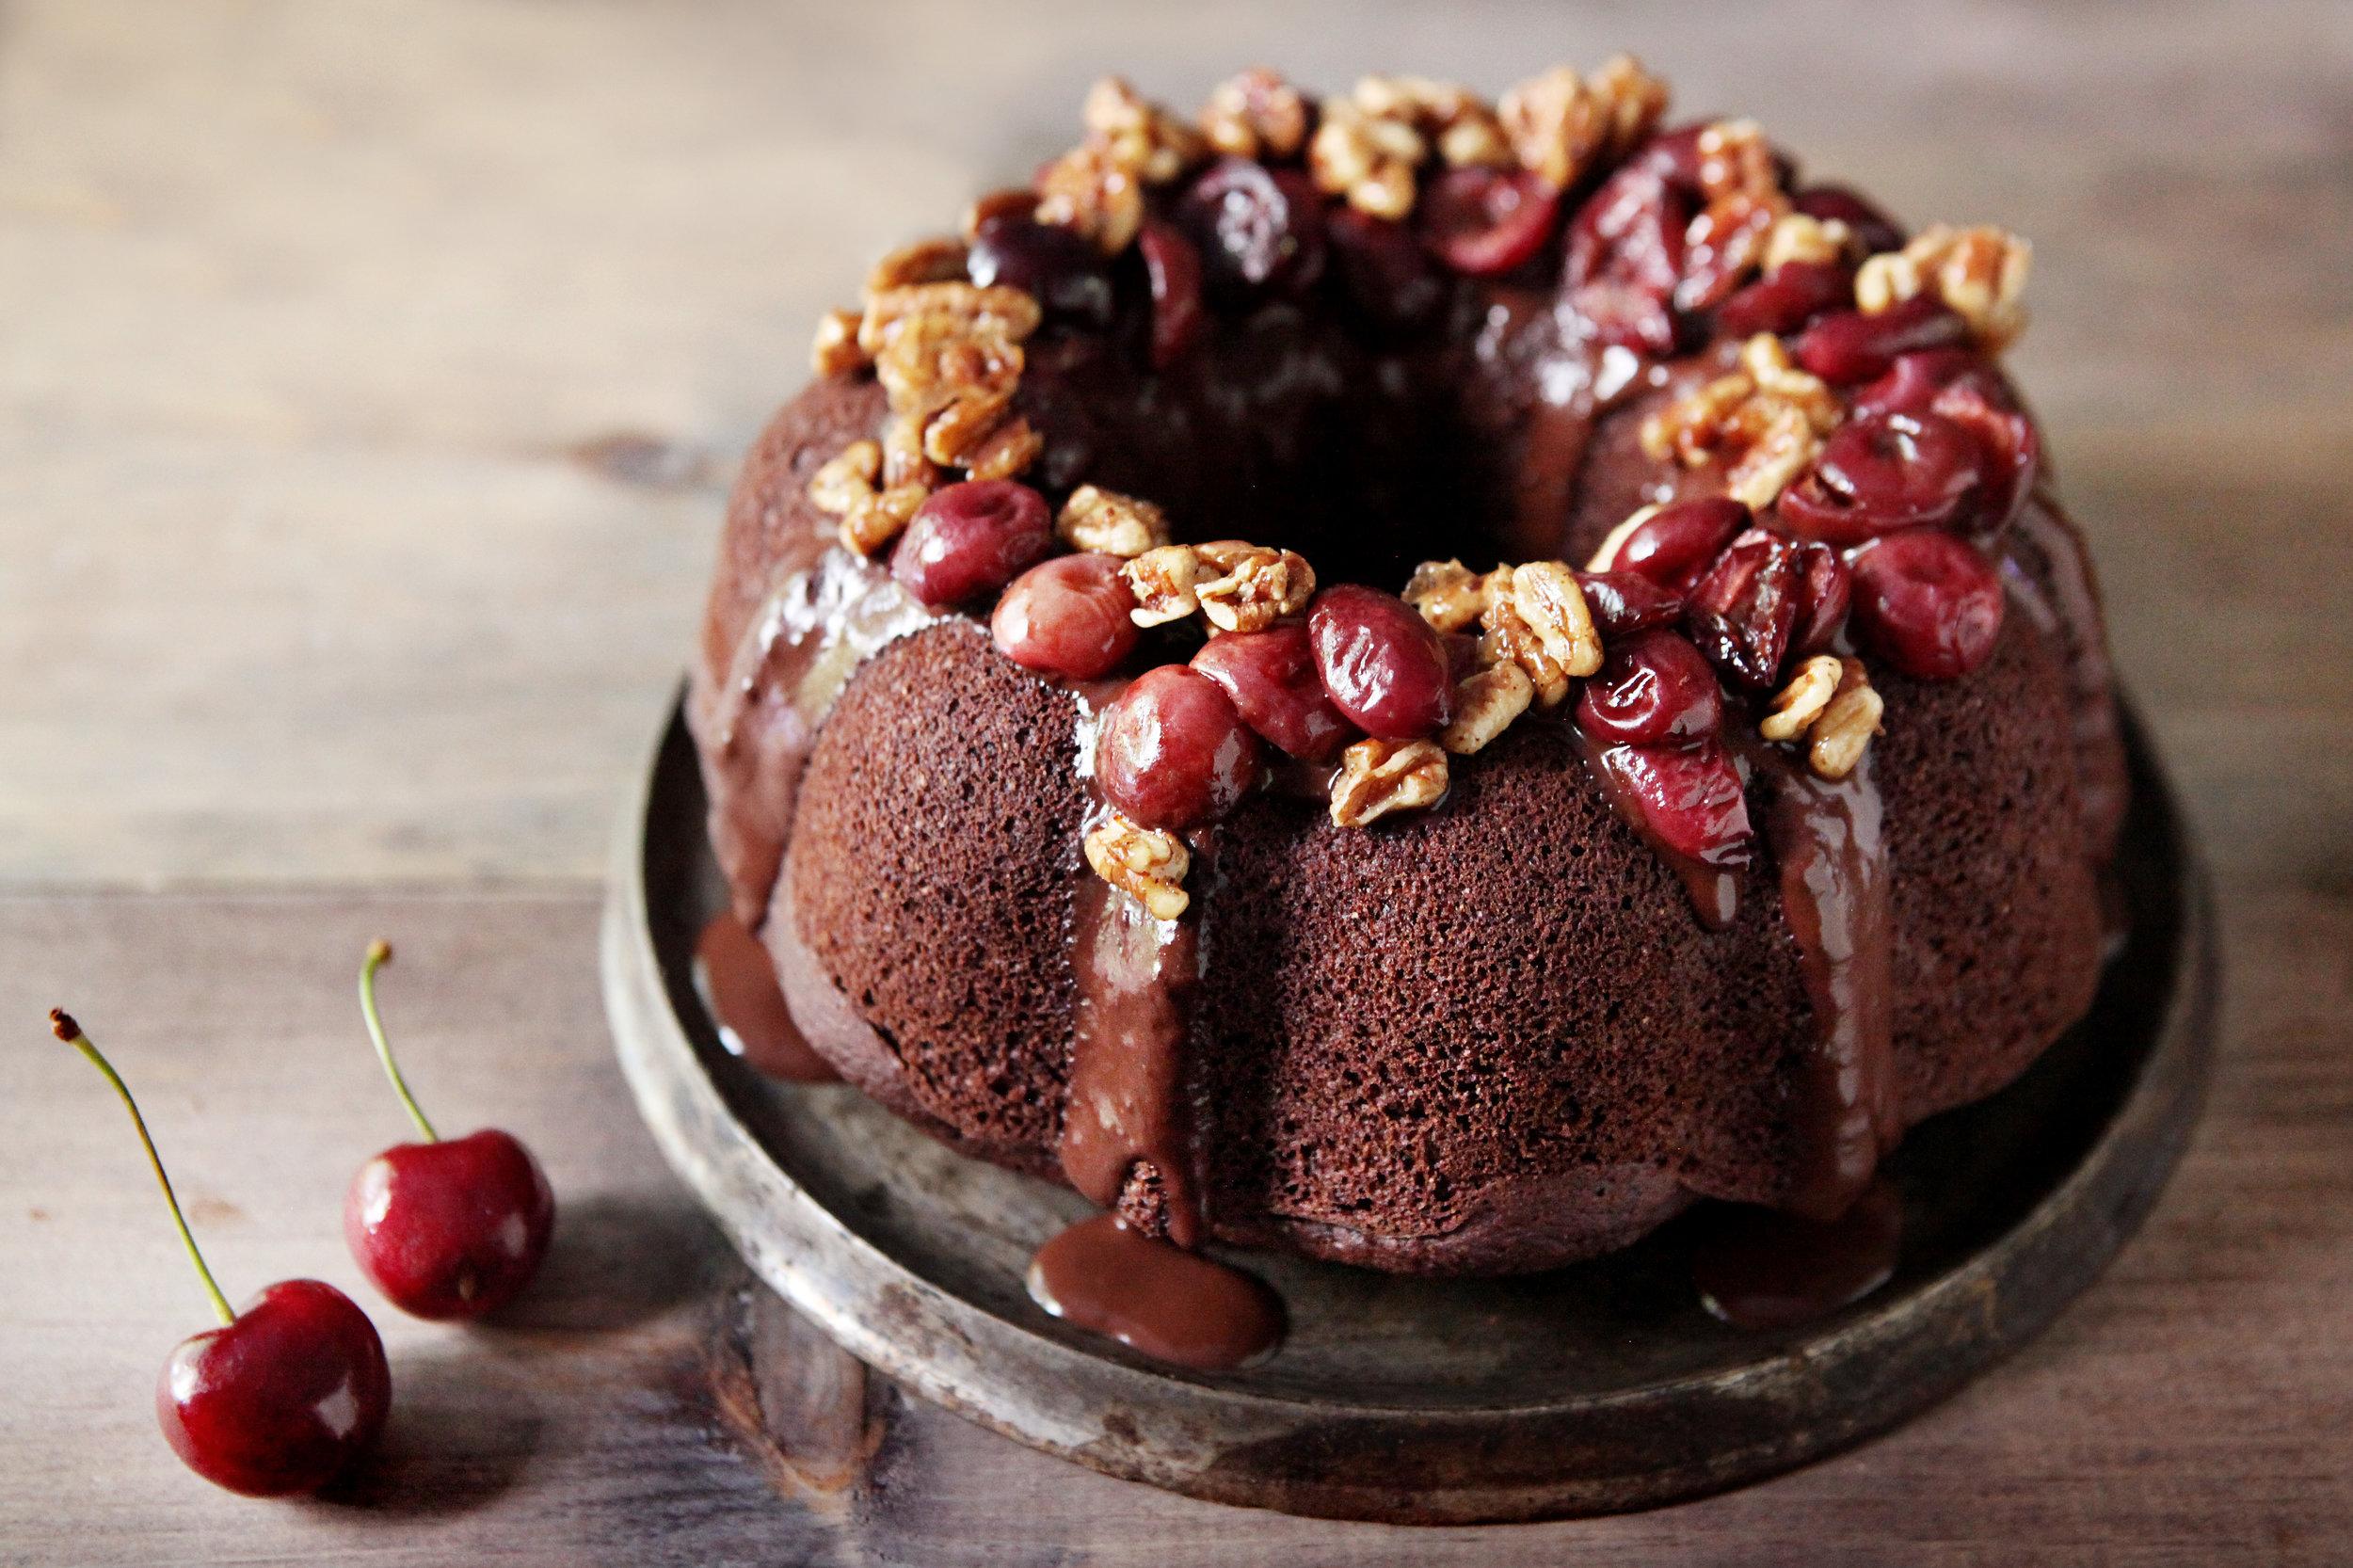 Chocolate Chipotle Cake - Recipe by diana bezankiServes 7